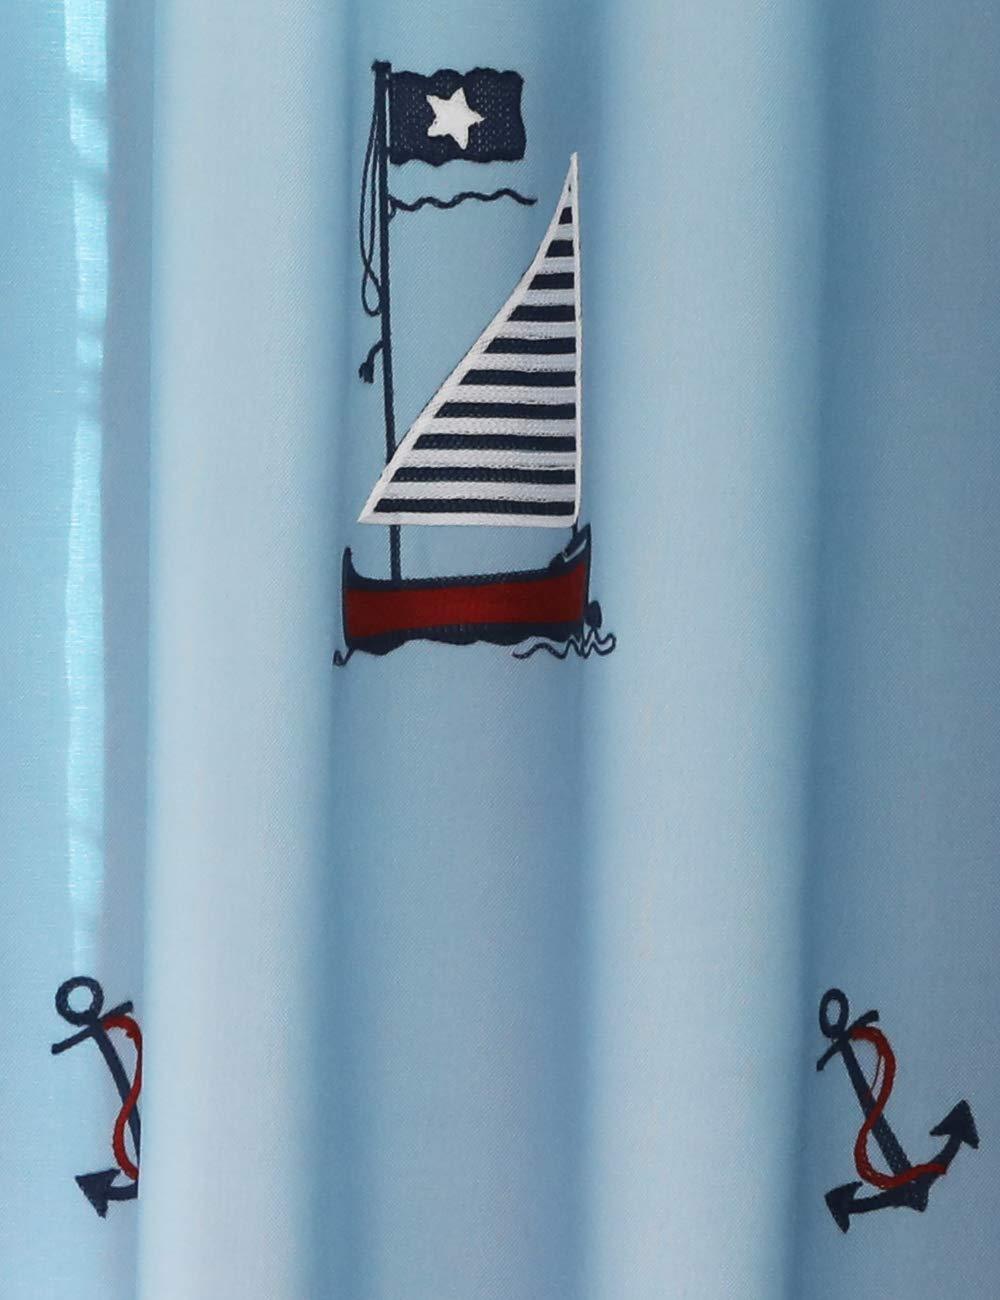 Lactraum Vorhang Kinderzimmer Junge Transparent Wei/ß Maritim mit /Ösen Bestickt Segelboot Anker Voile 100 x 245cm